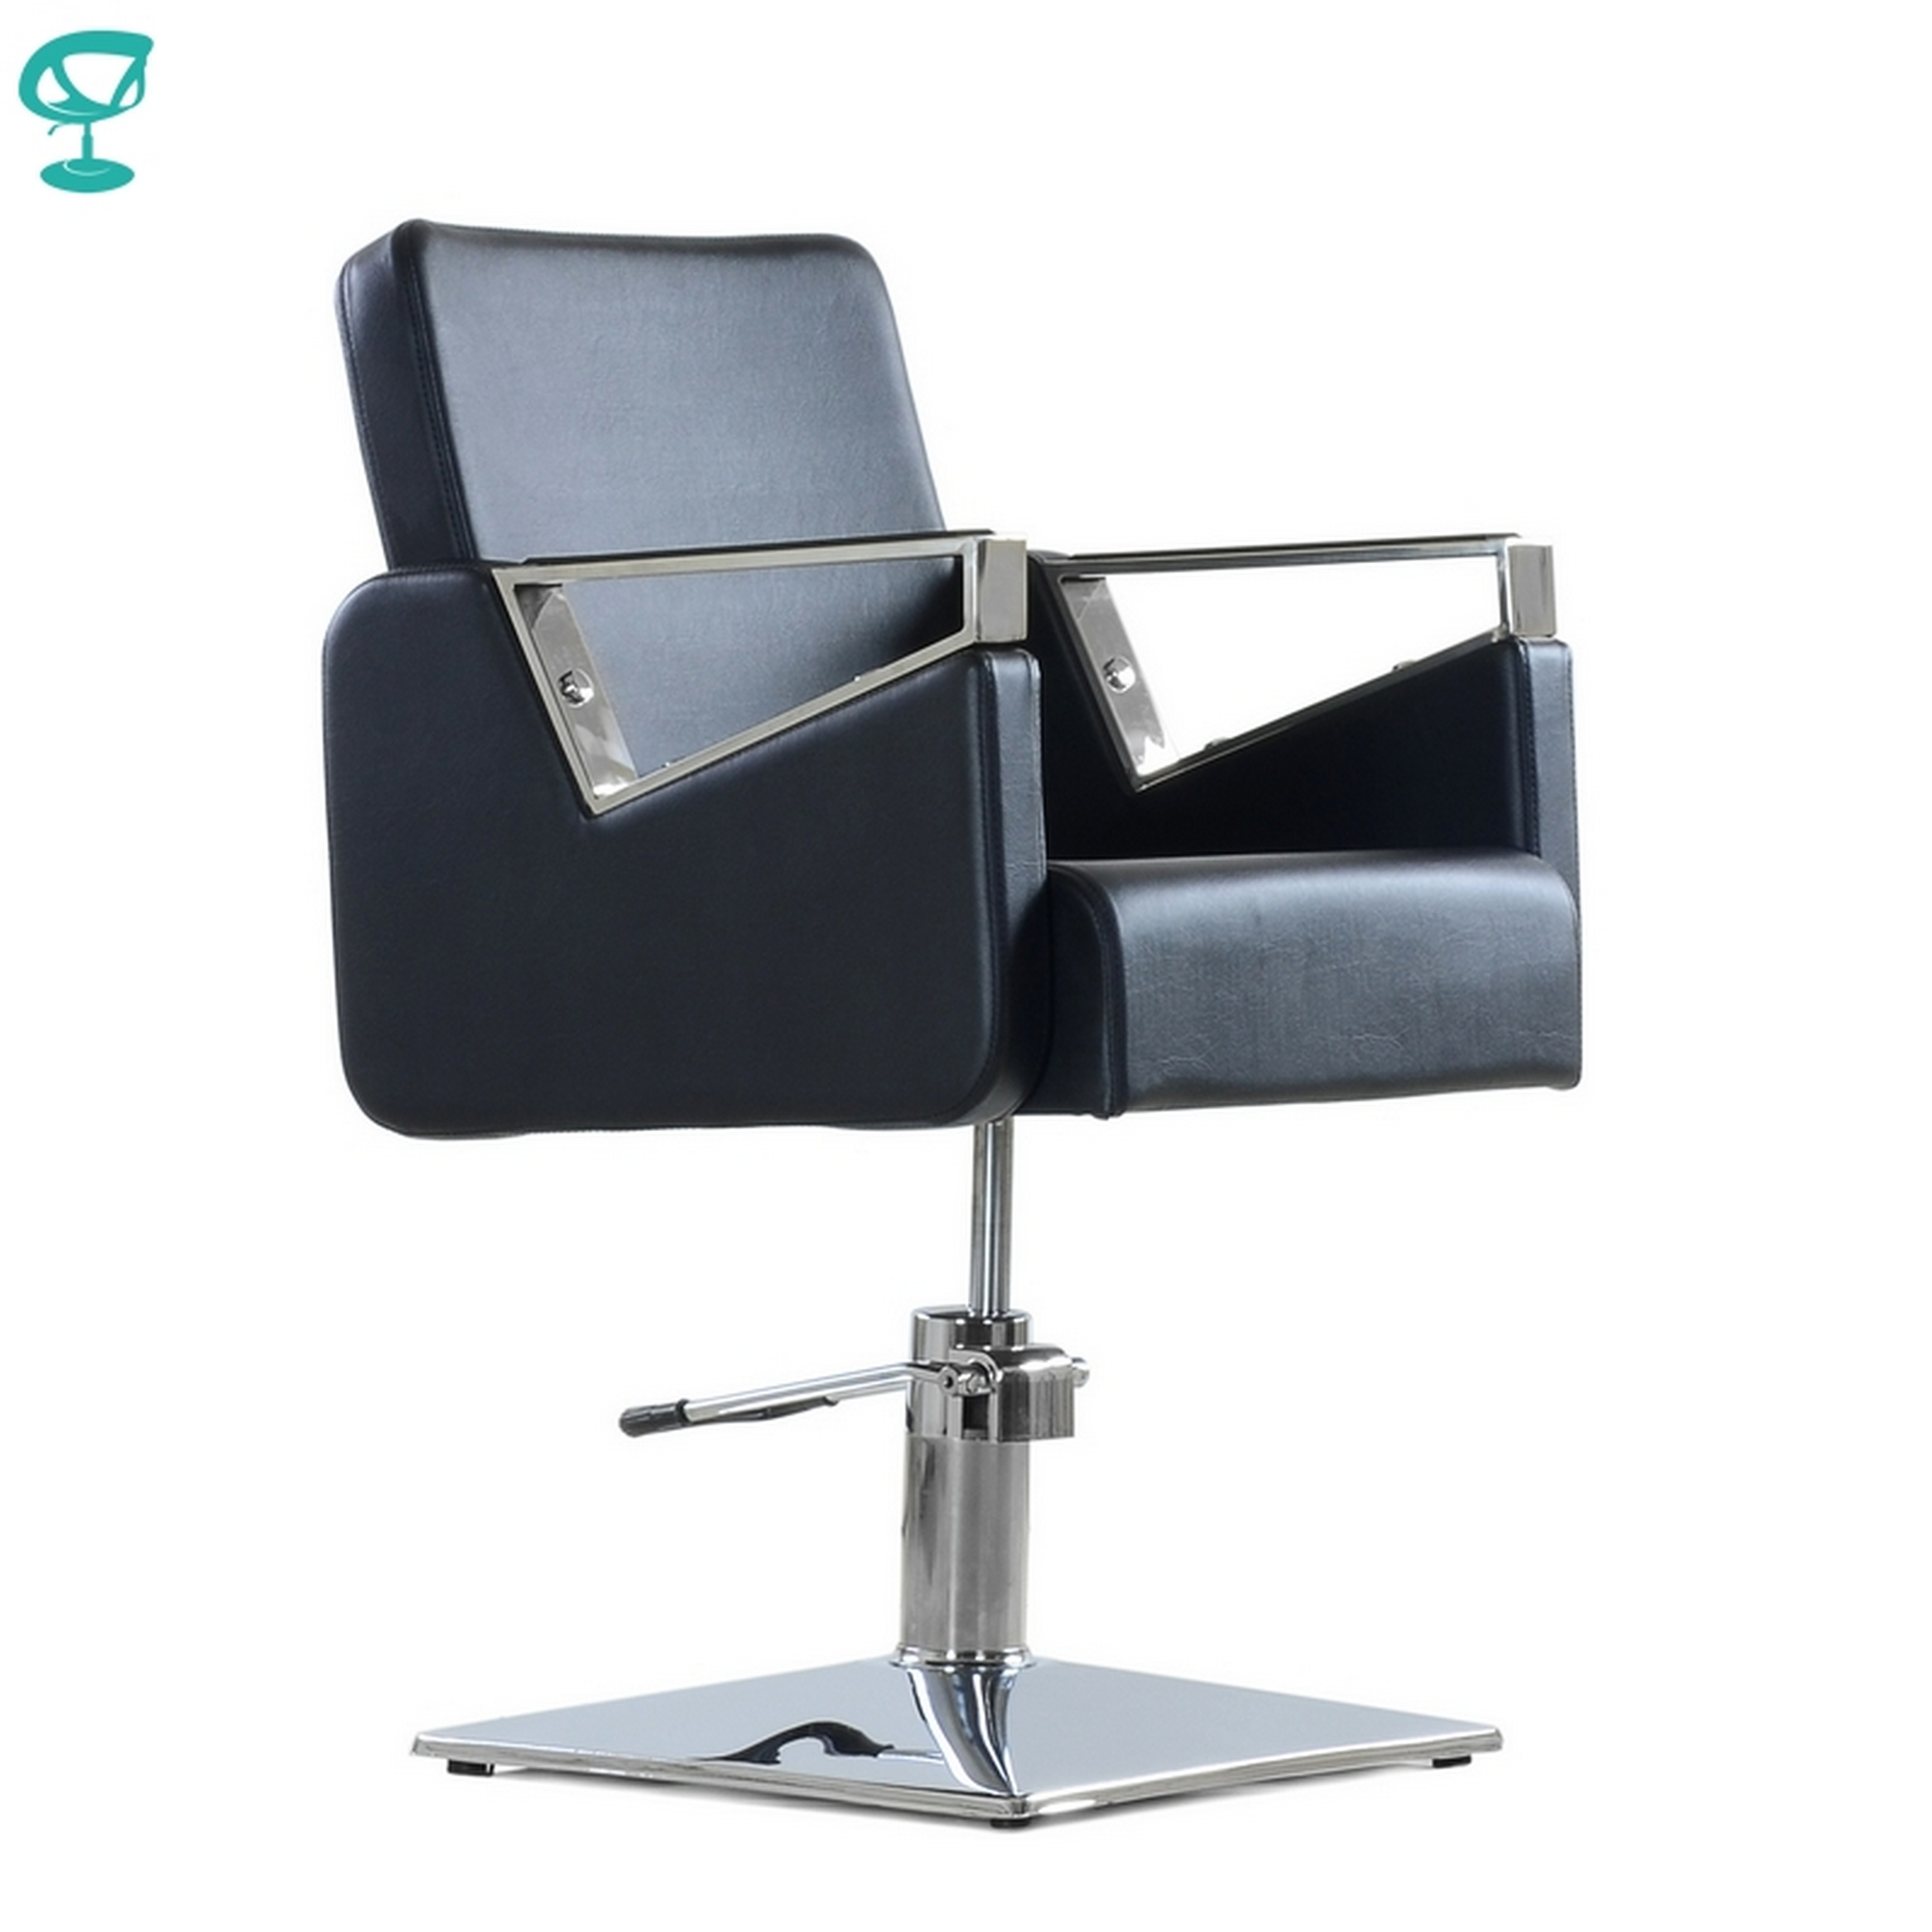 95707 Barneo 6300V5 Chair Salon Chair Black Chair барбершопа Chair Free Shipping To Russia